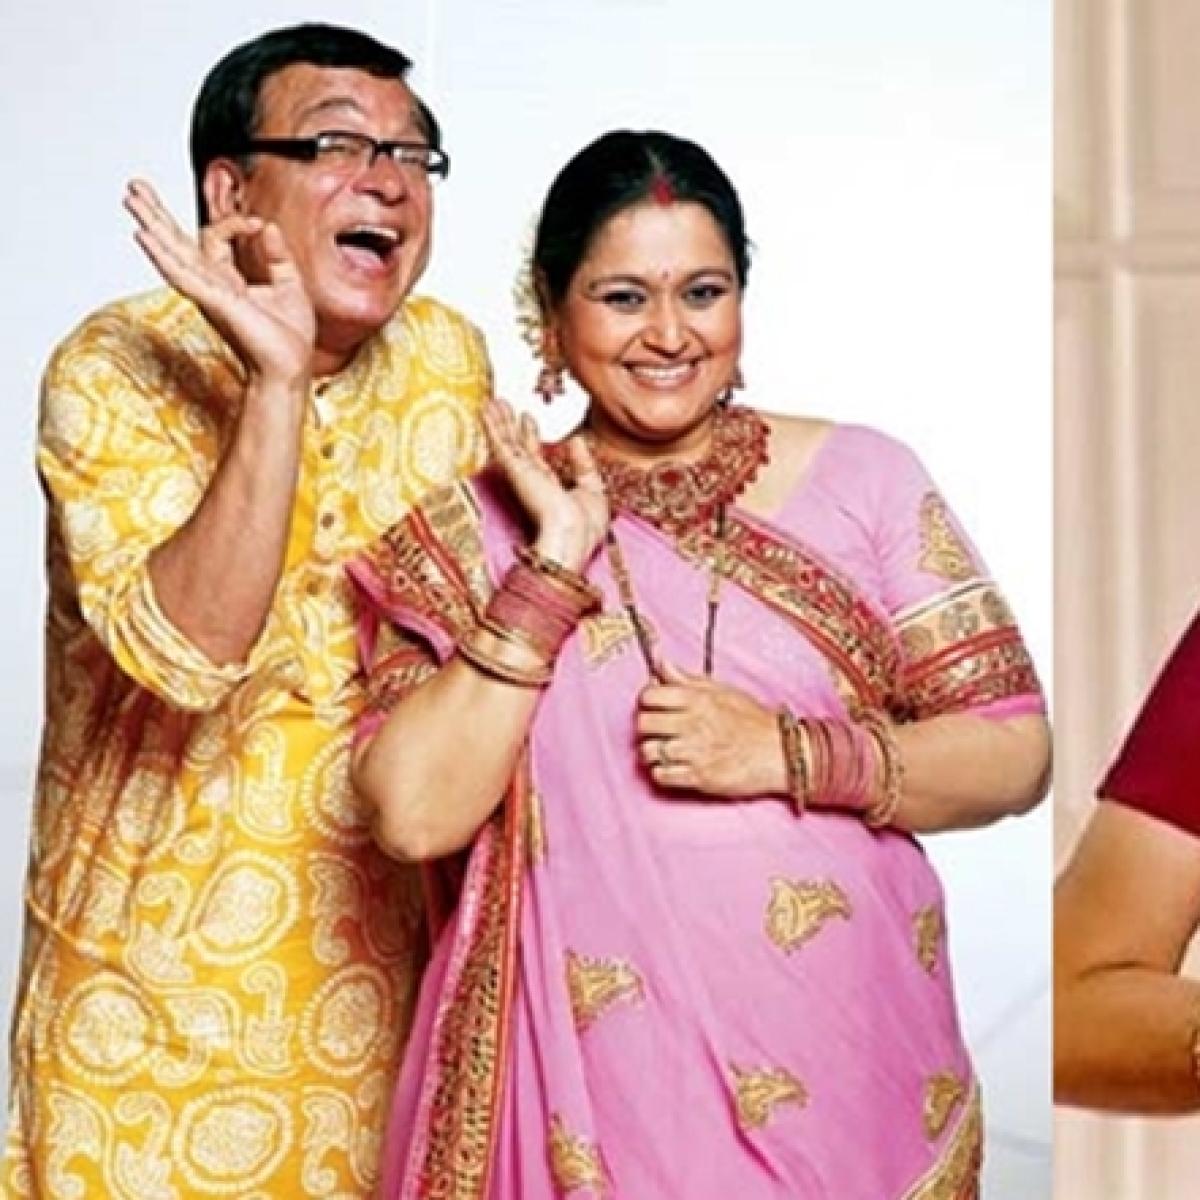 Iconic comedy shows 'Khichdi' and 'Sarabhai vs Sarabhai' to re-telecast amid COVID-19 lockdown